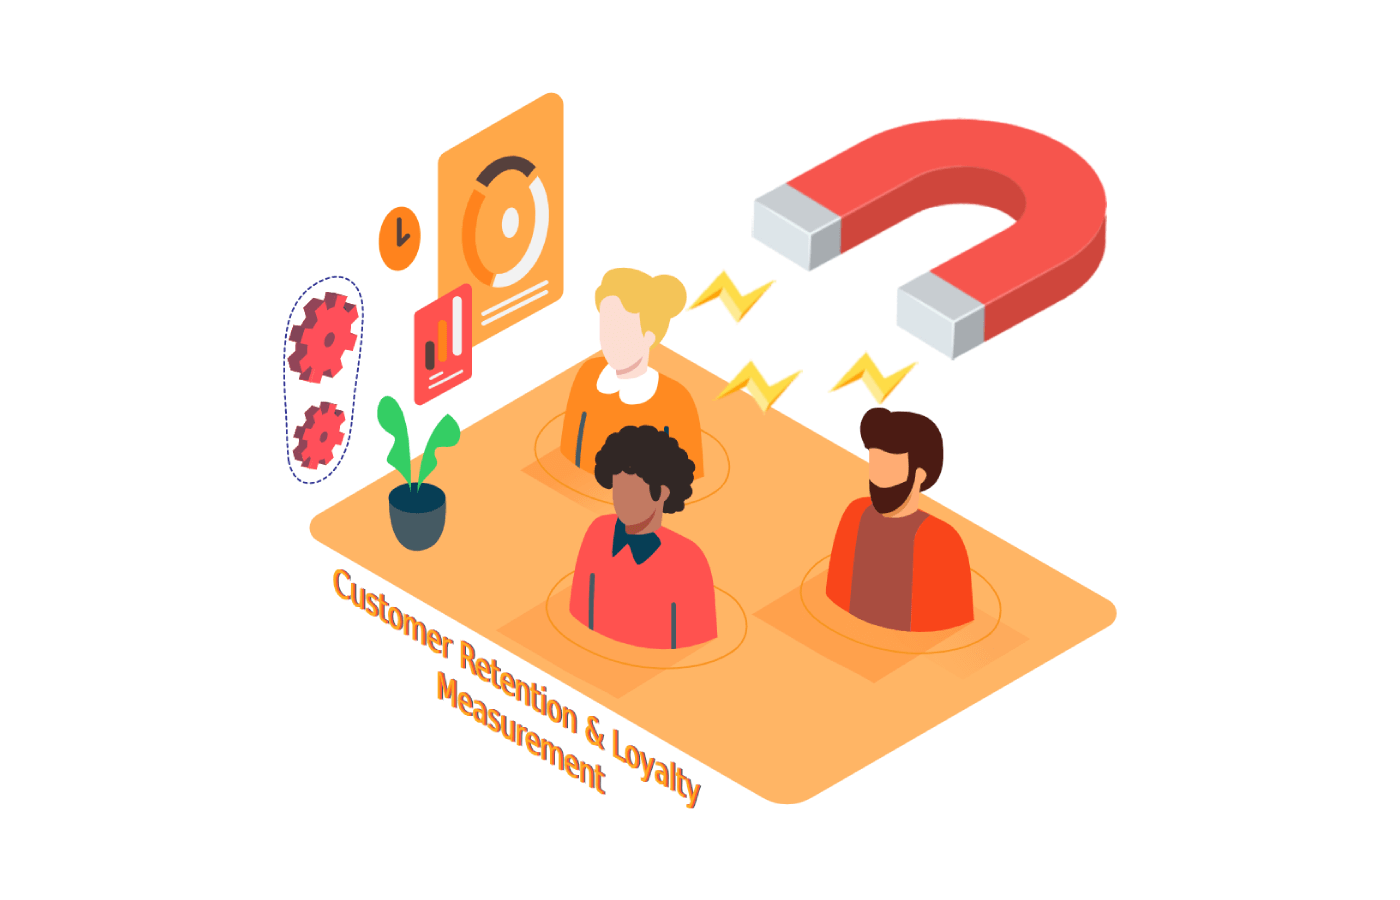 customer_retention_loyalty_measurement